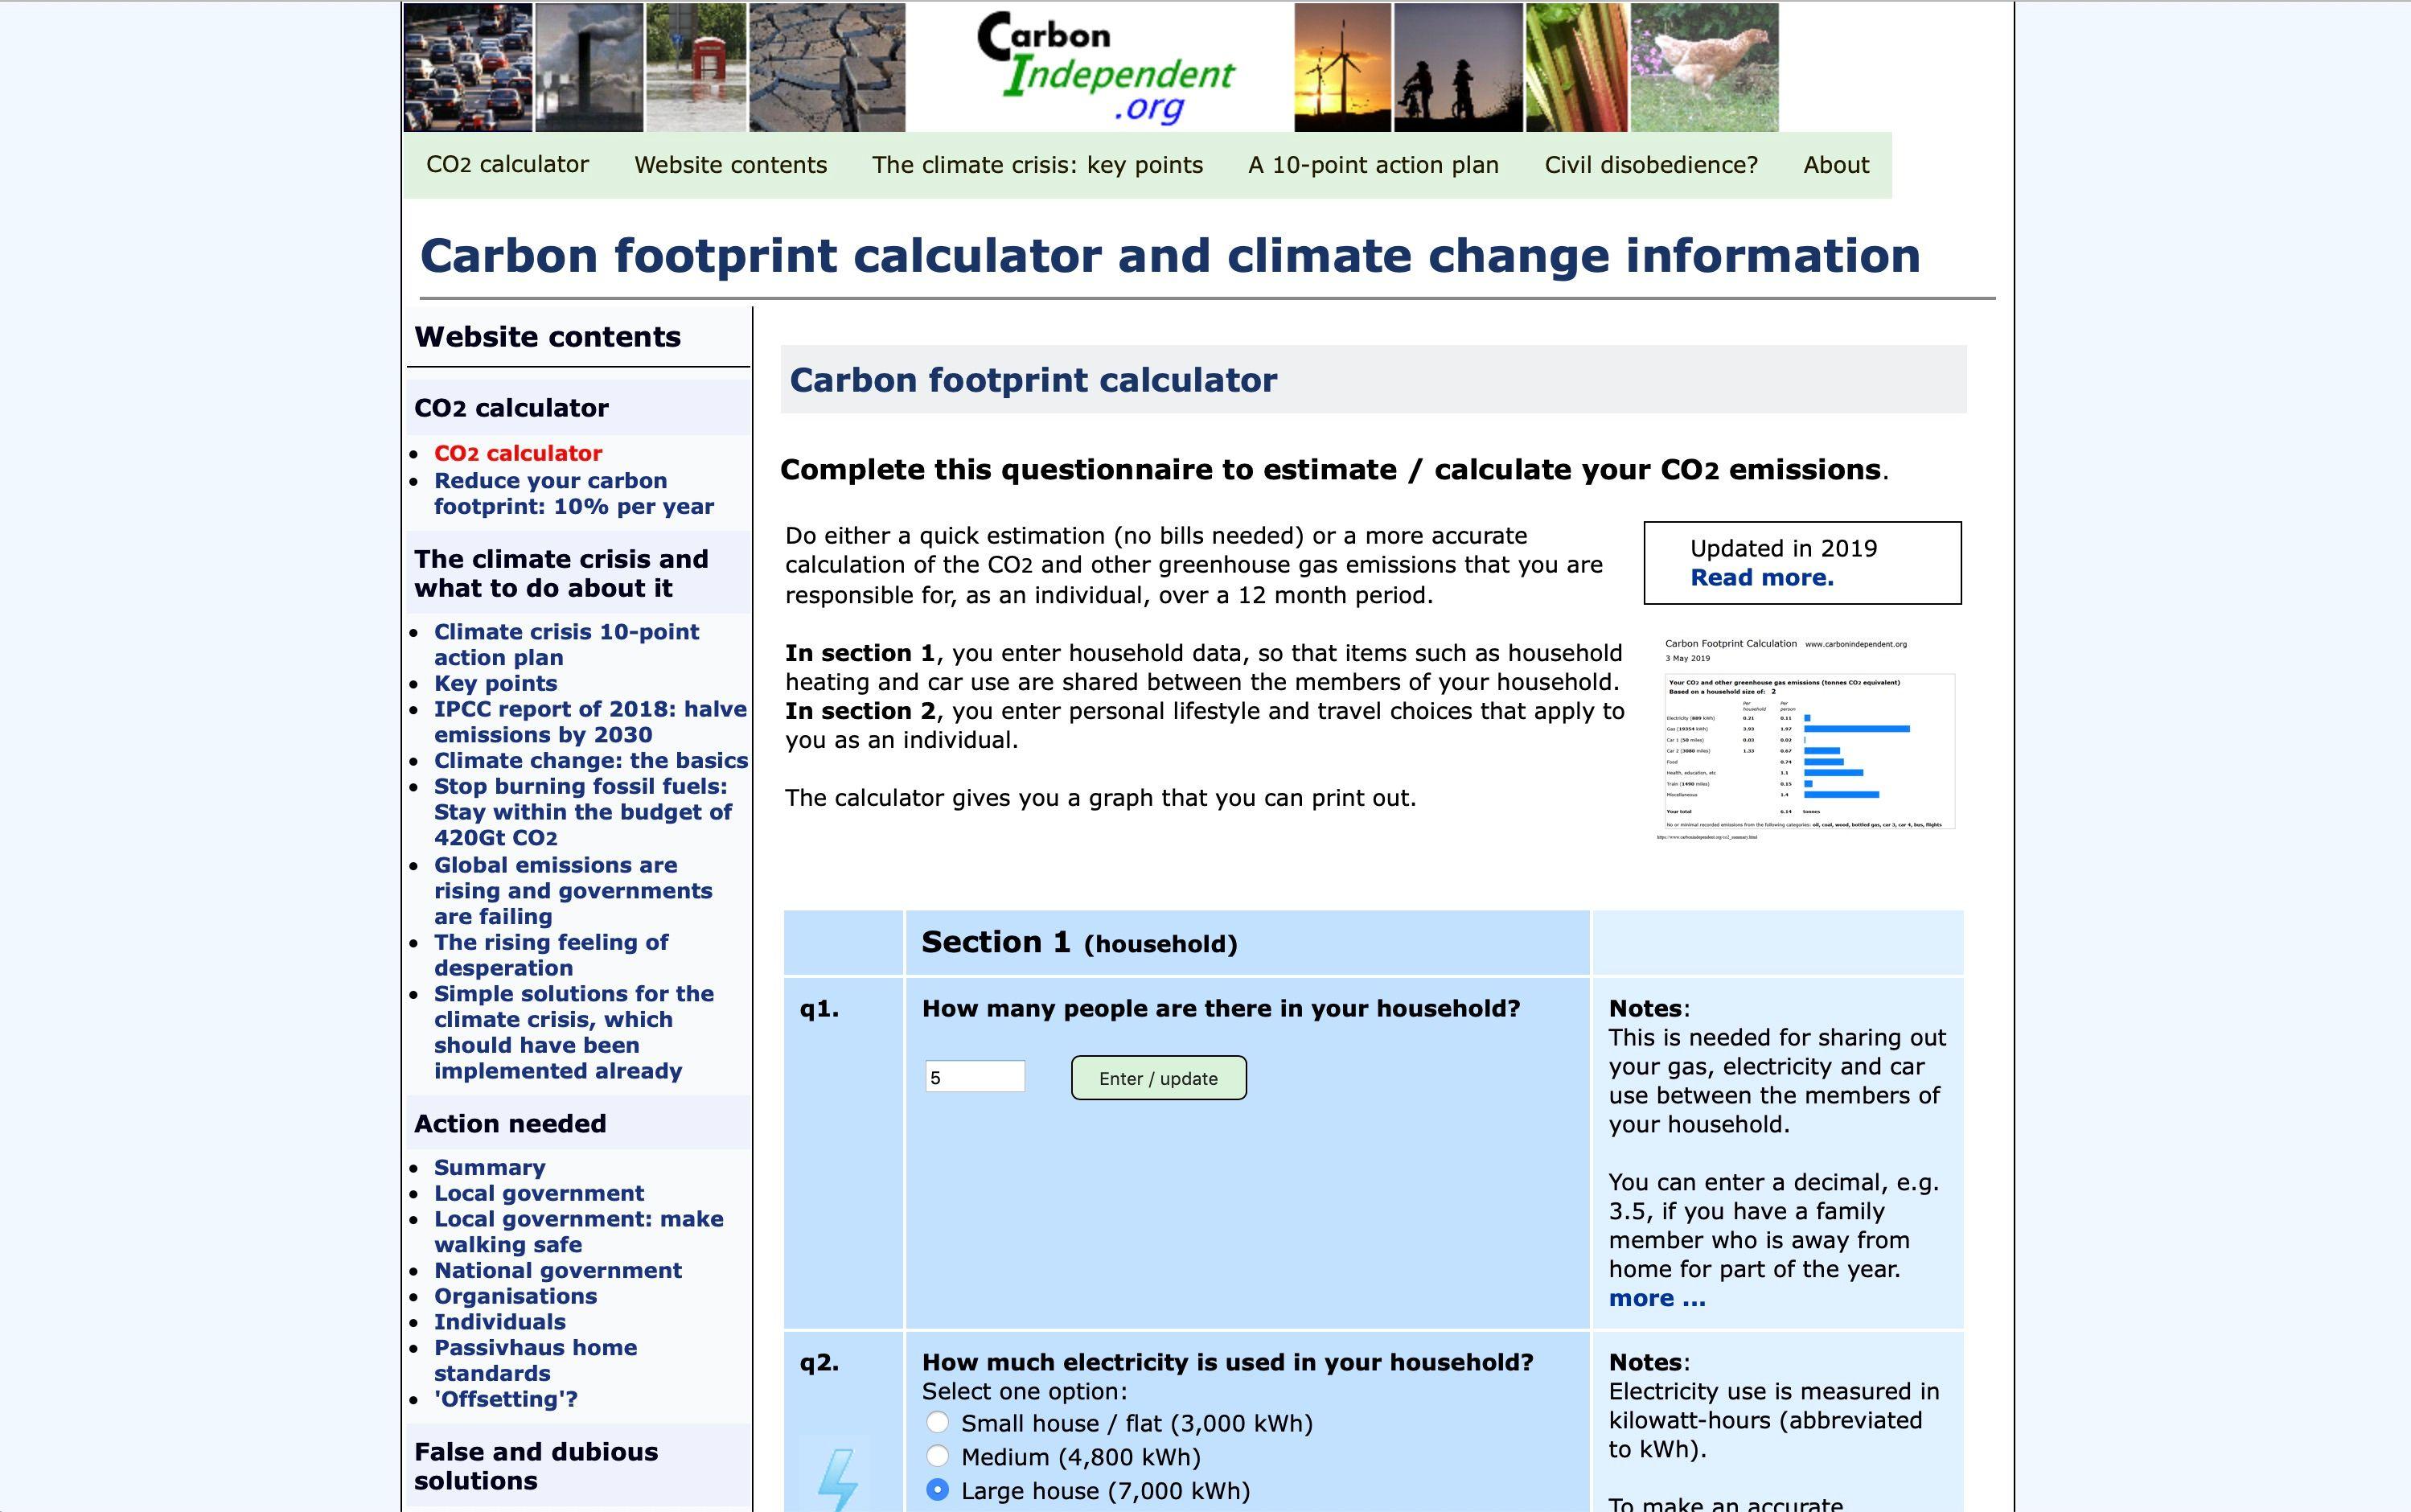 Carbon Independent calculator FB